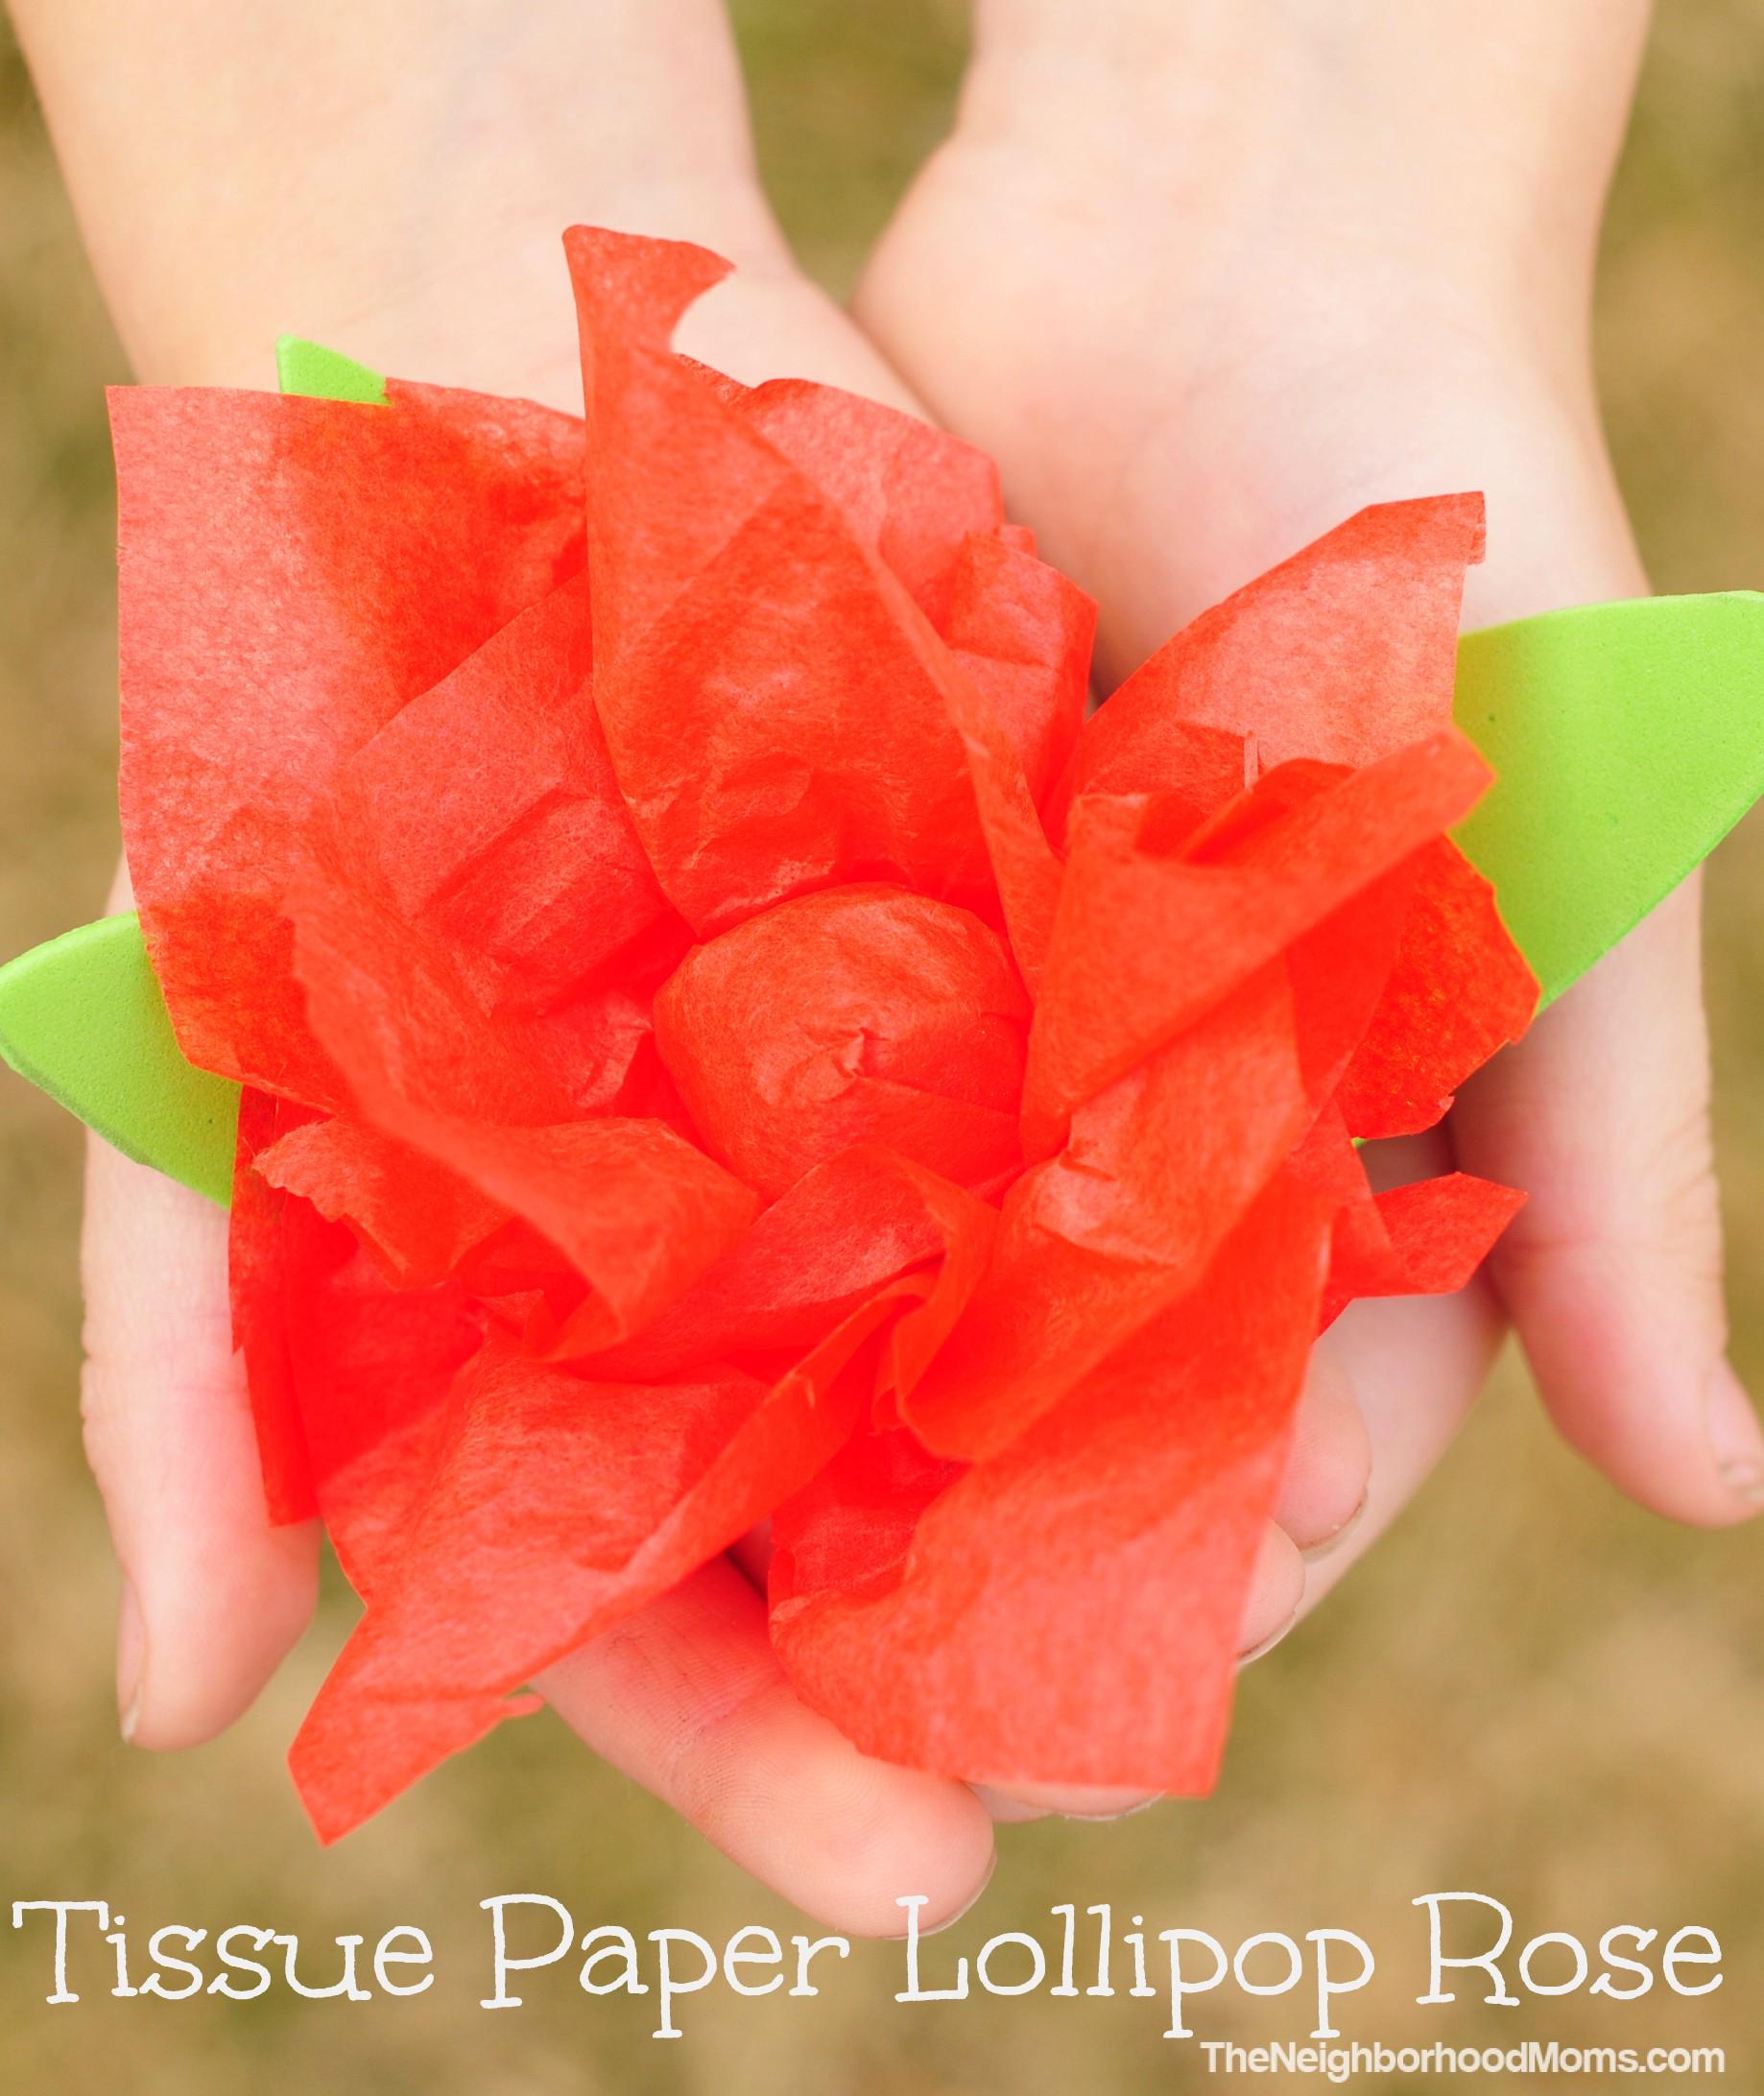 Tissue Paper Lollipop Rose The Neighborhood Moms